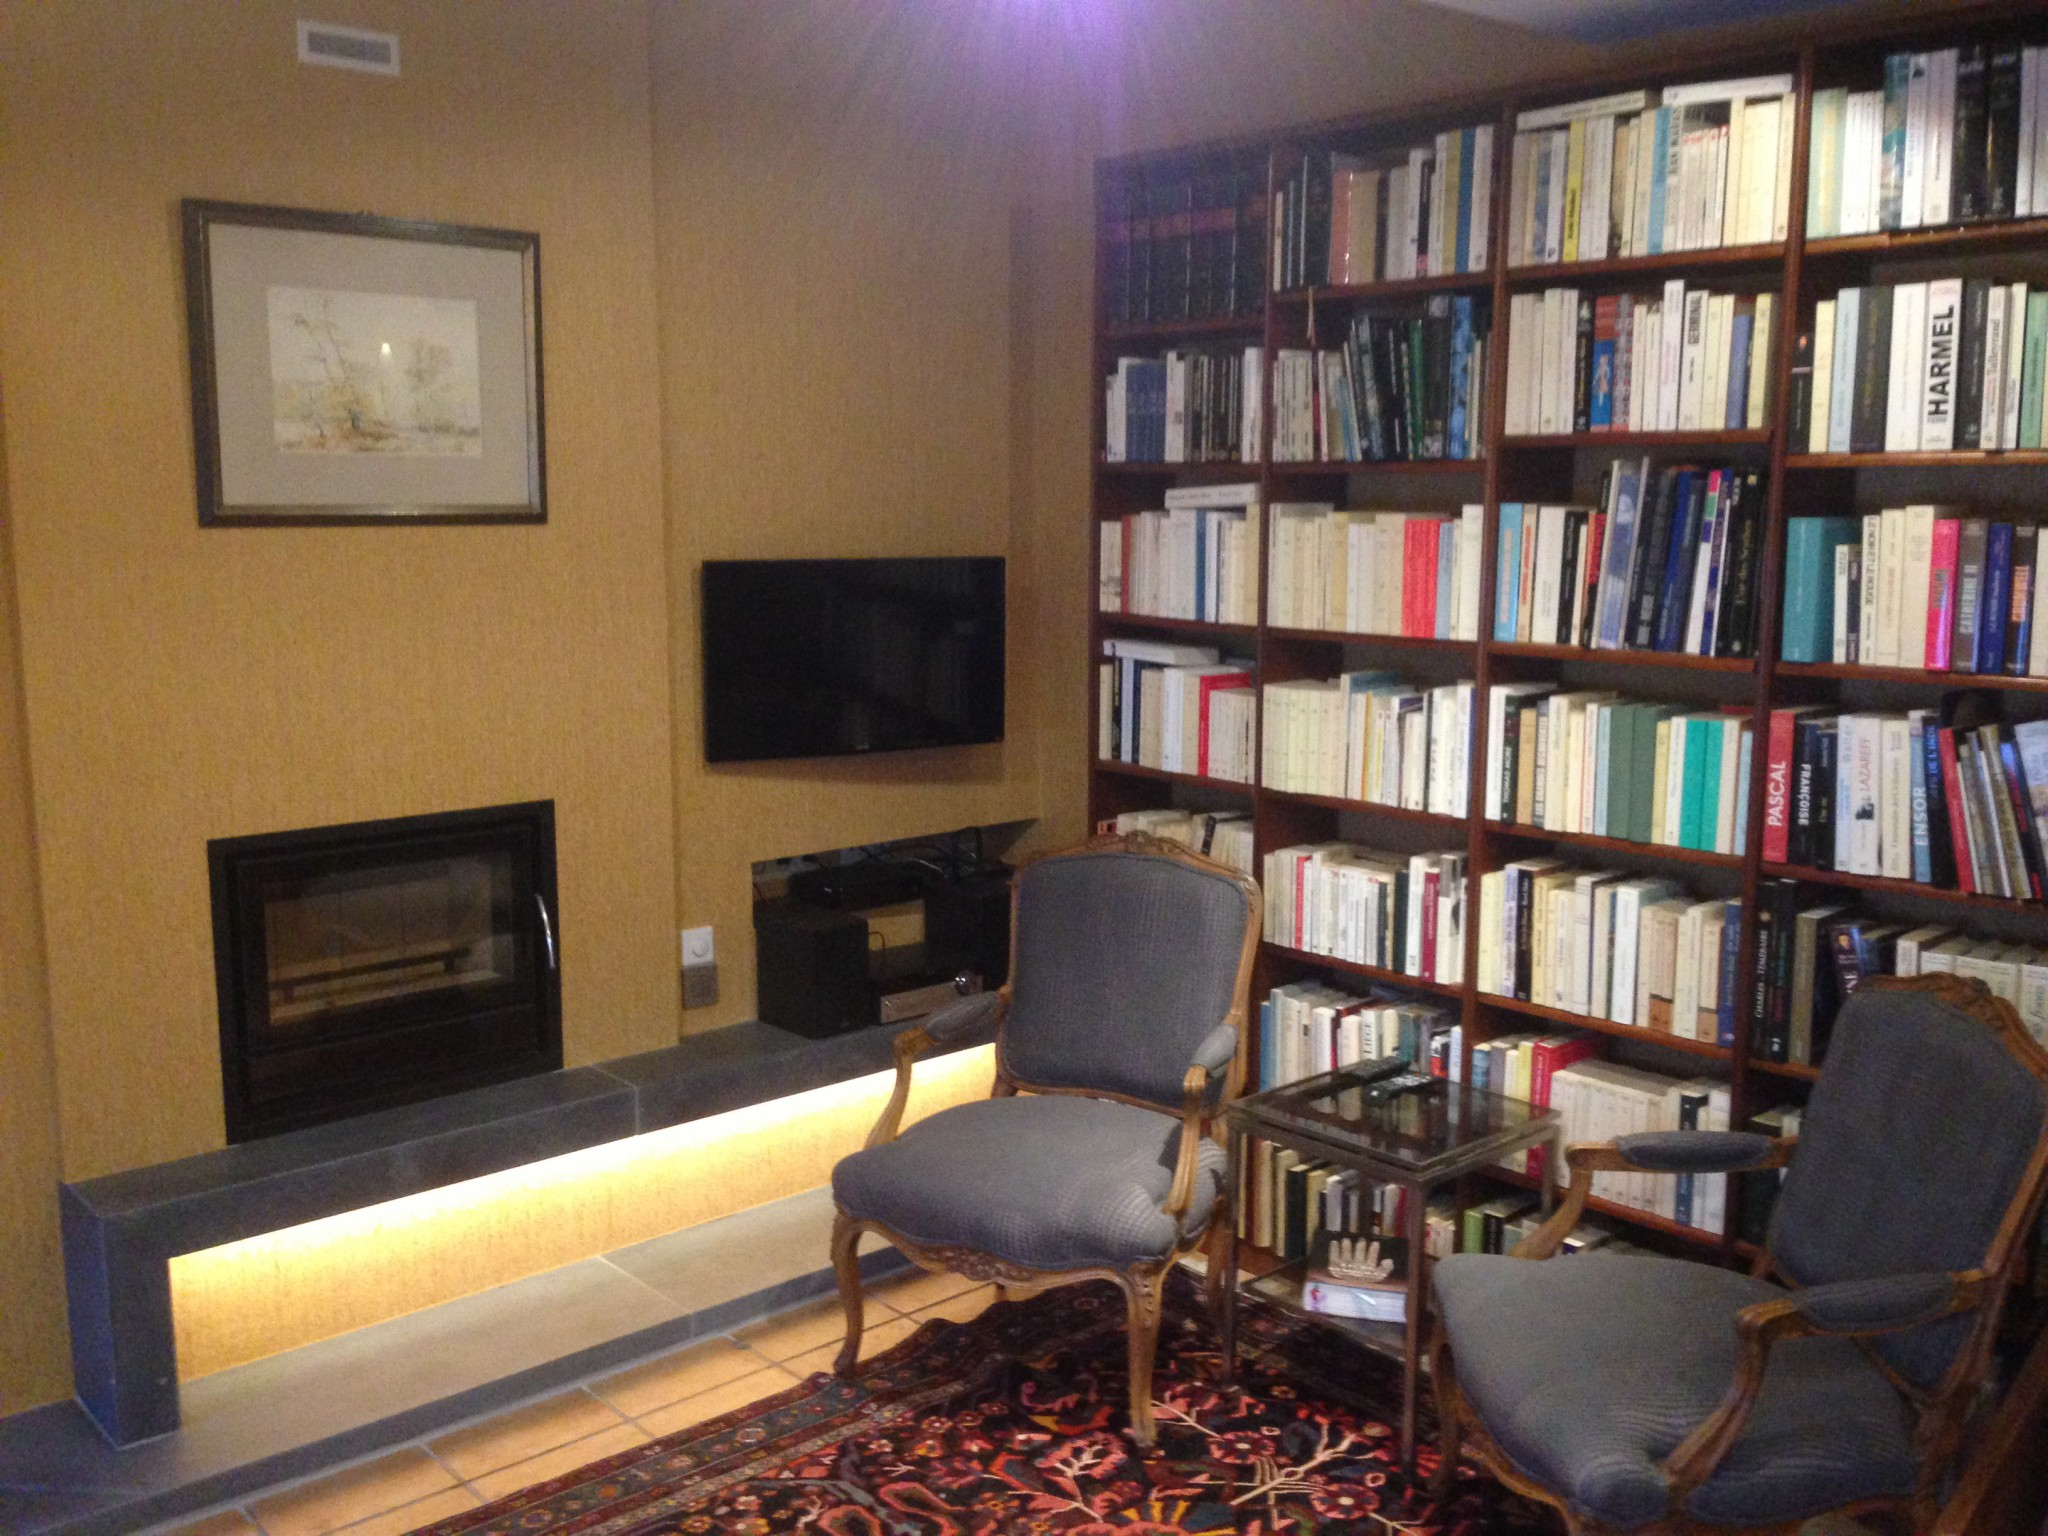 pojet h architecte brice tilkin li ge 2 bureau d 39 architecture tilkin. Black Bedroom Furniture Sets. Home Design Ideas